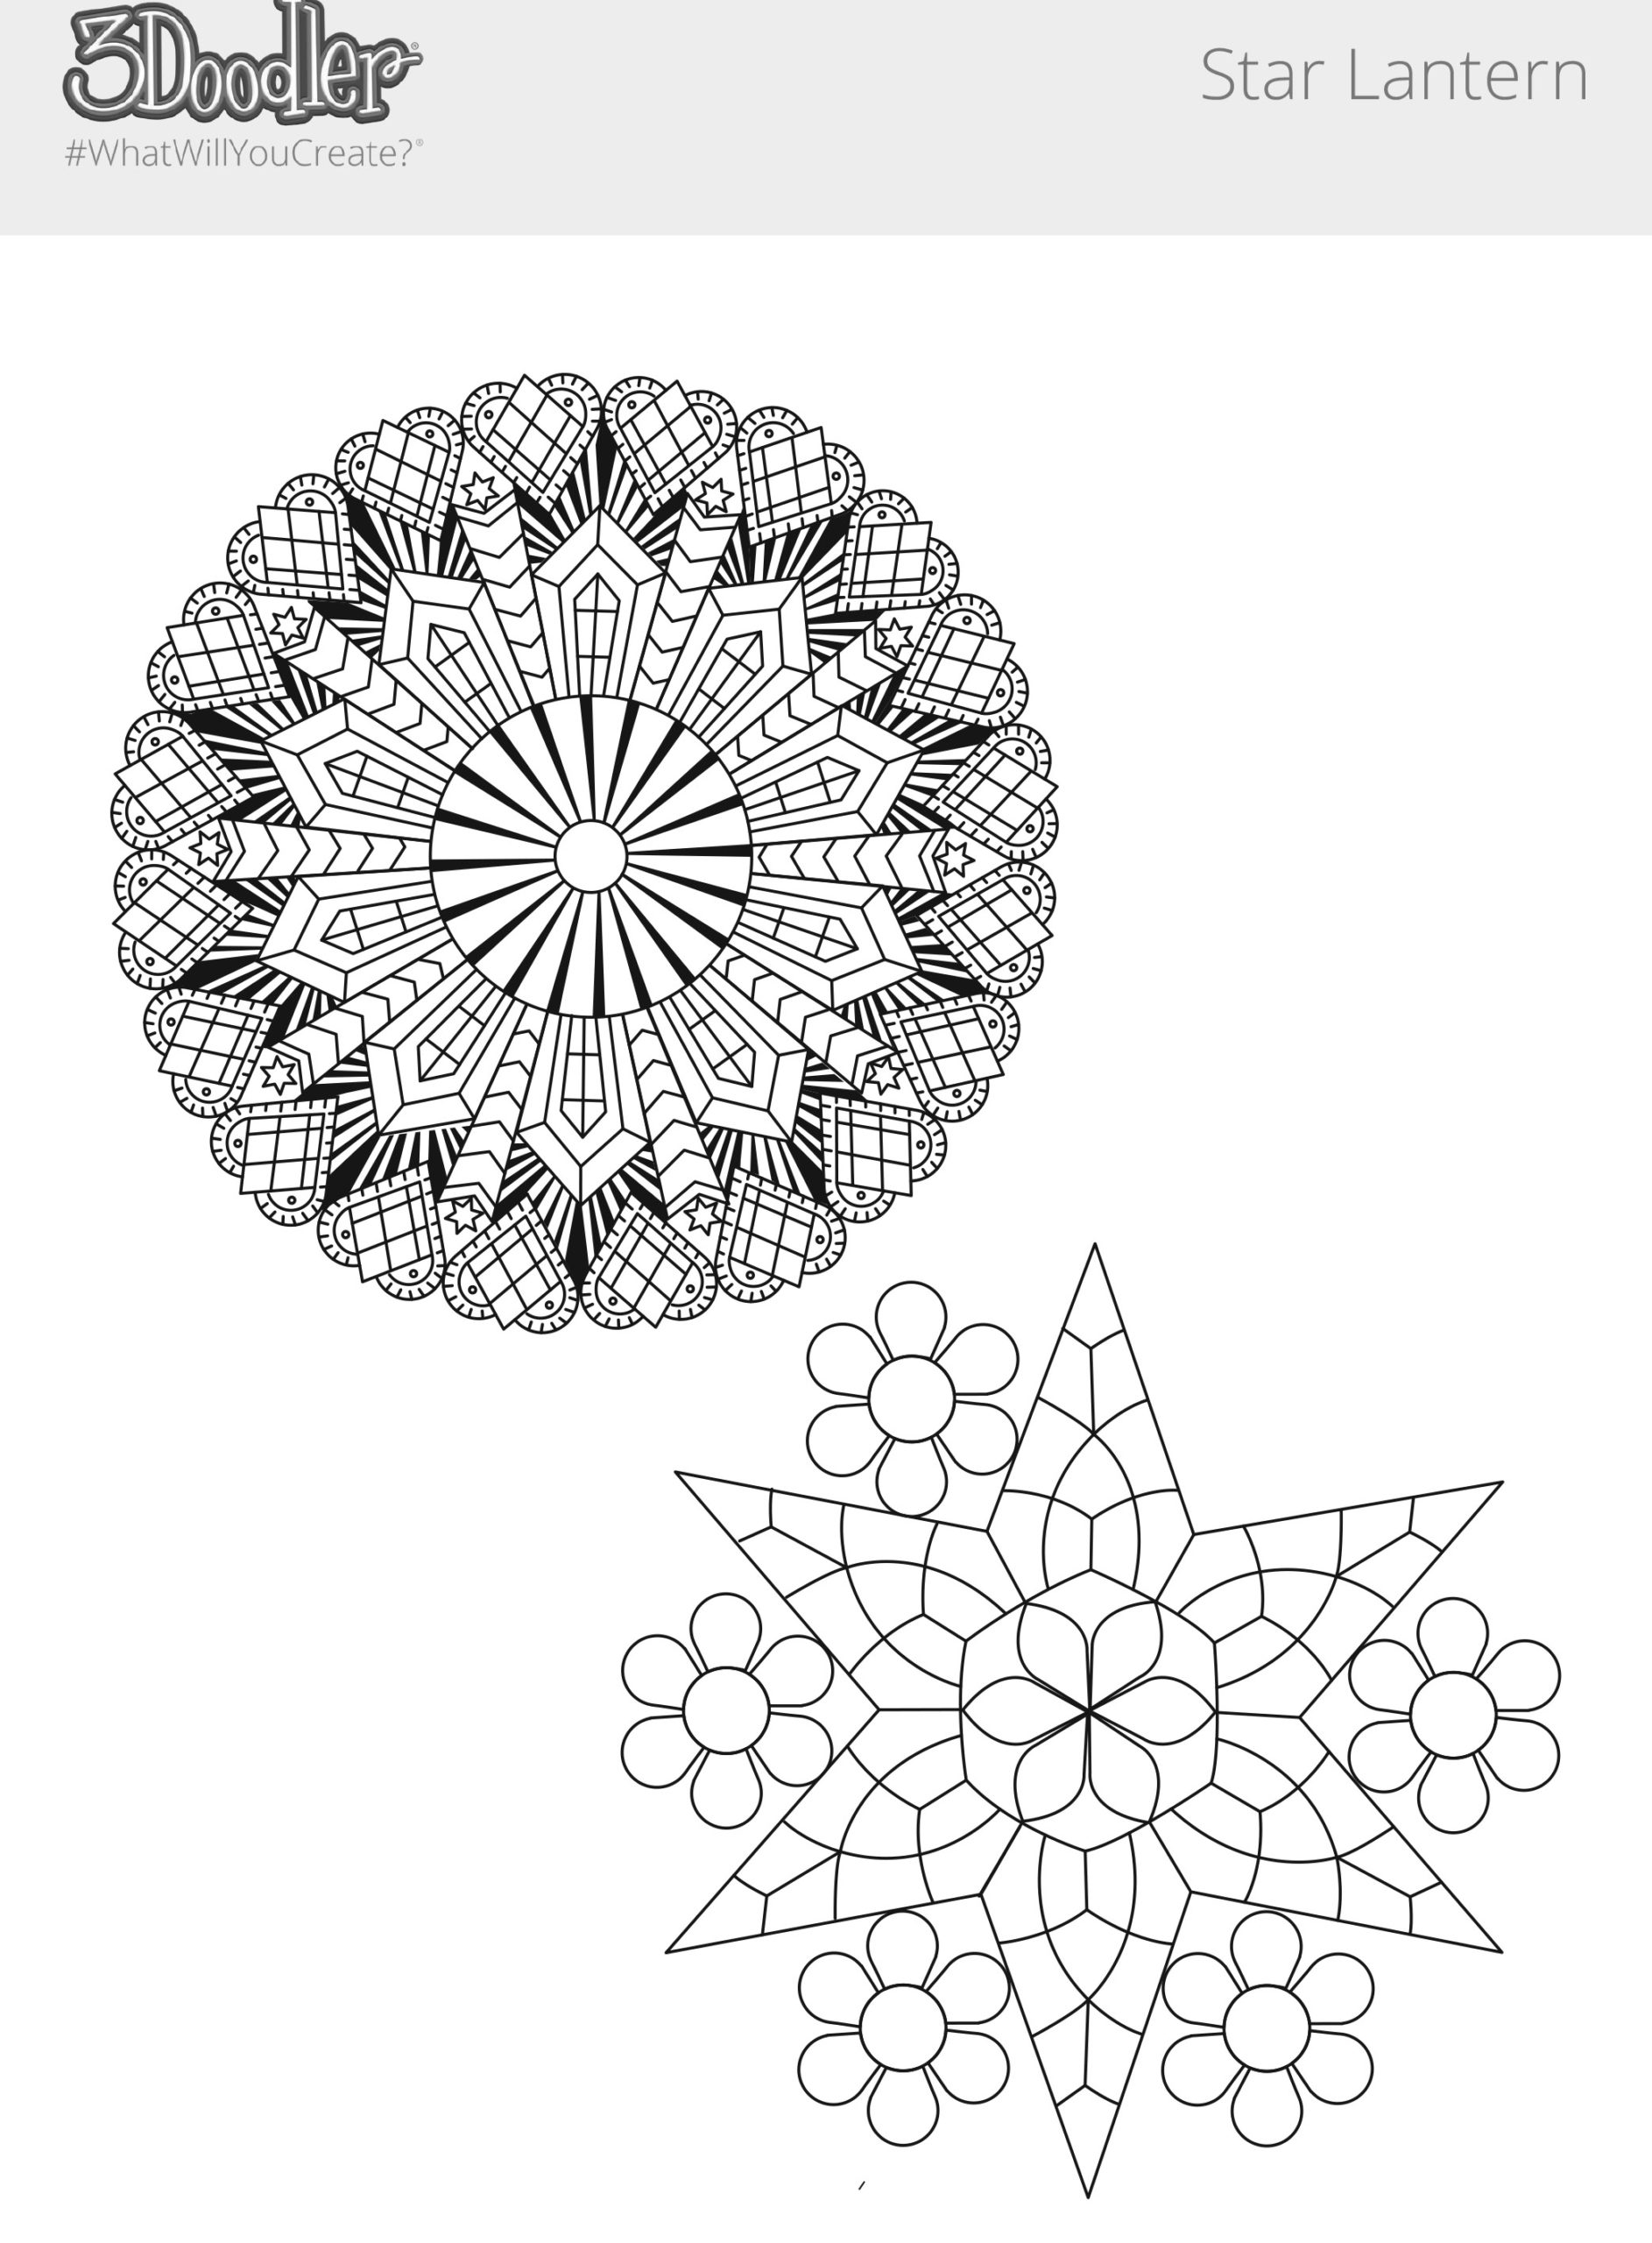 3D Pen Stencil Template Star Pendant & Star-Shaped Lantern